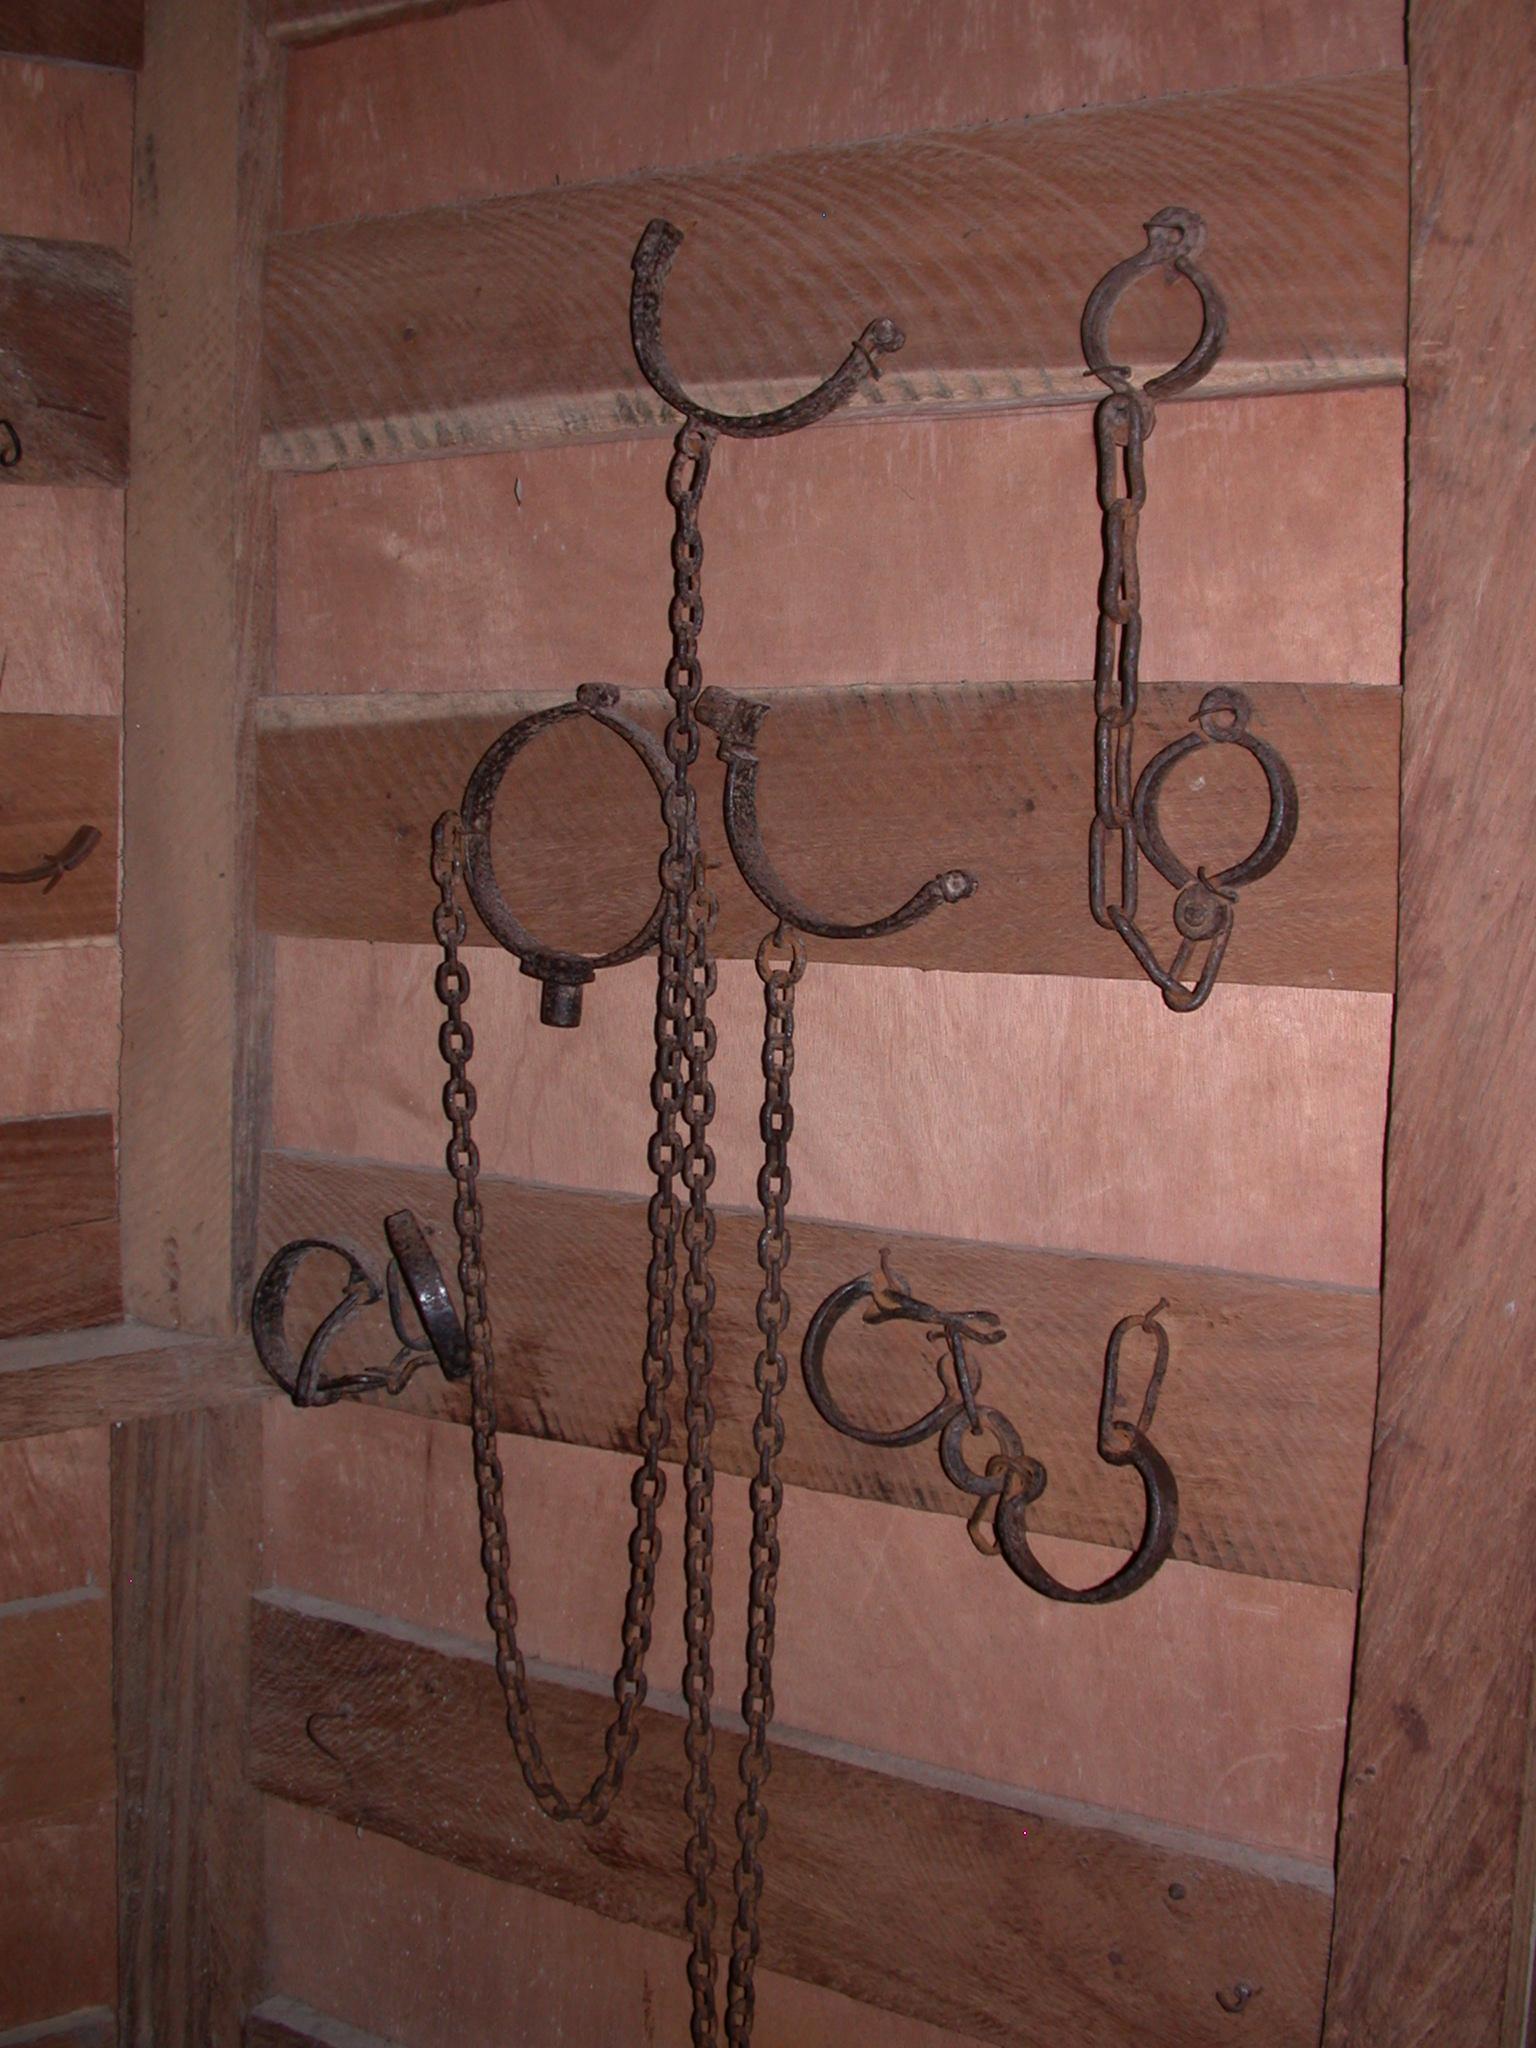 Slave Shackles, Cape Coast Slave Fort Museum, Cape Coast, Ghana